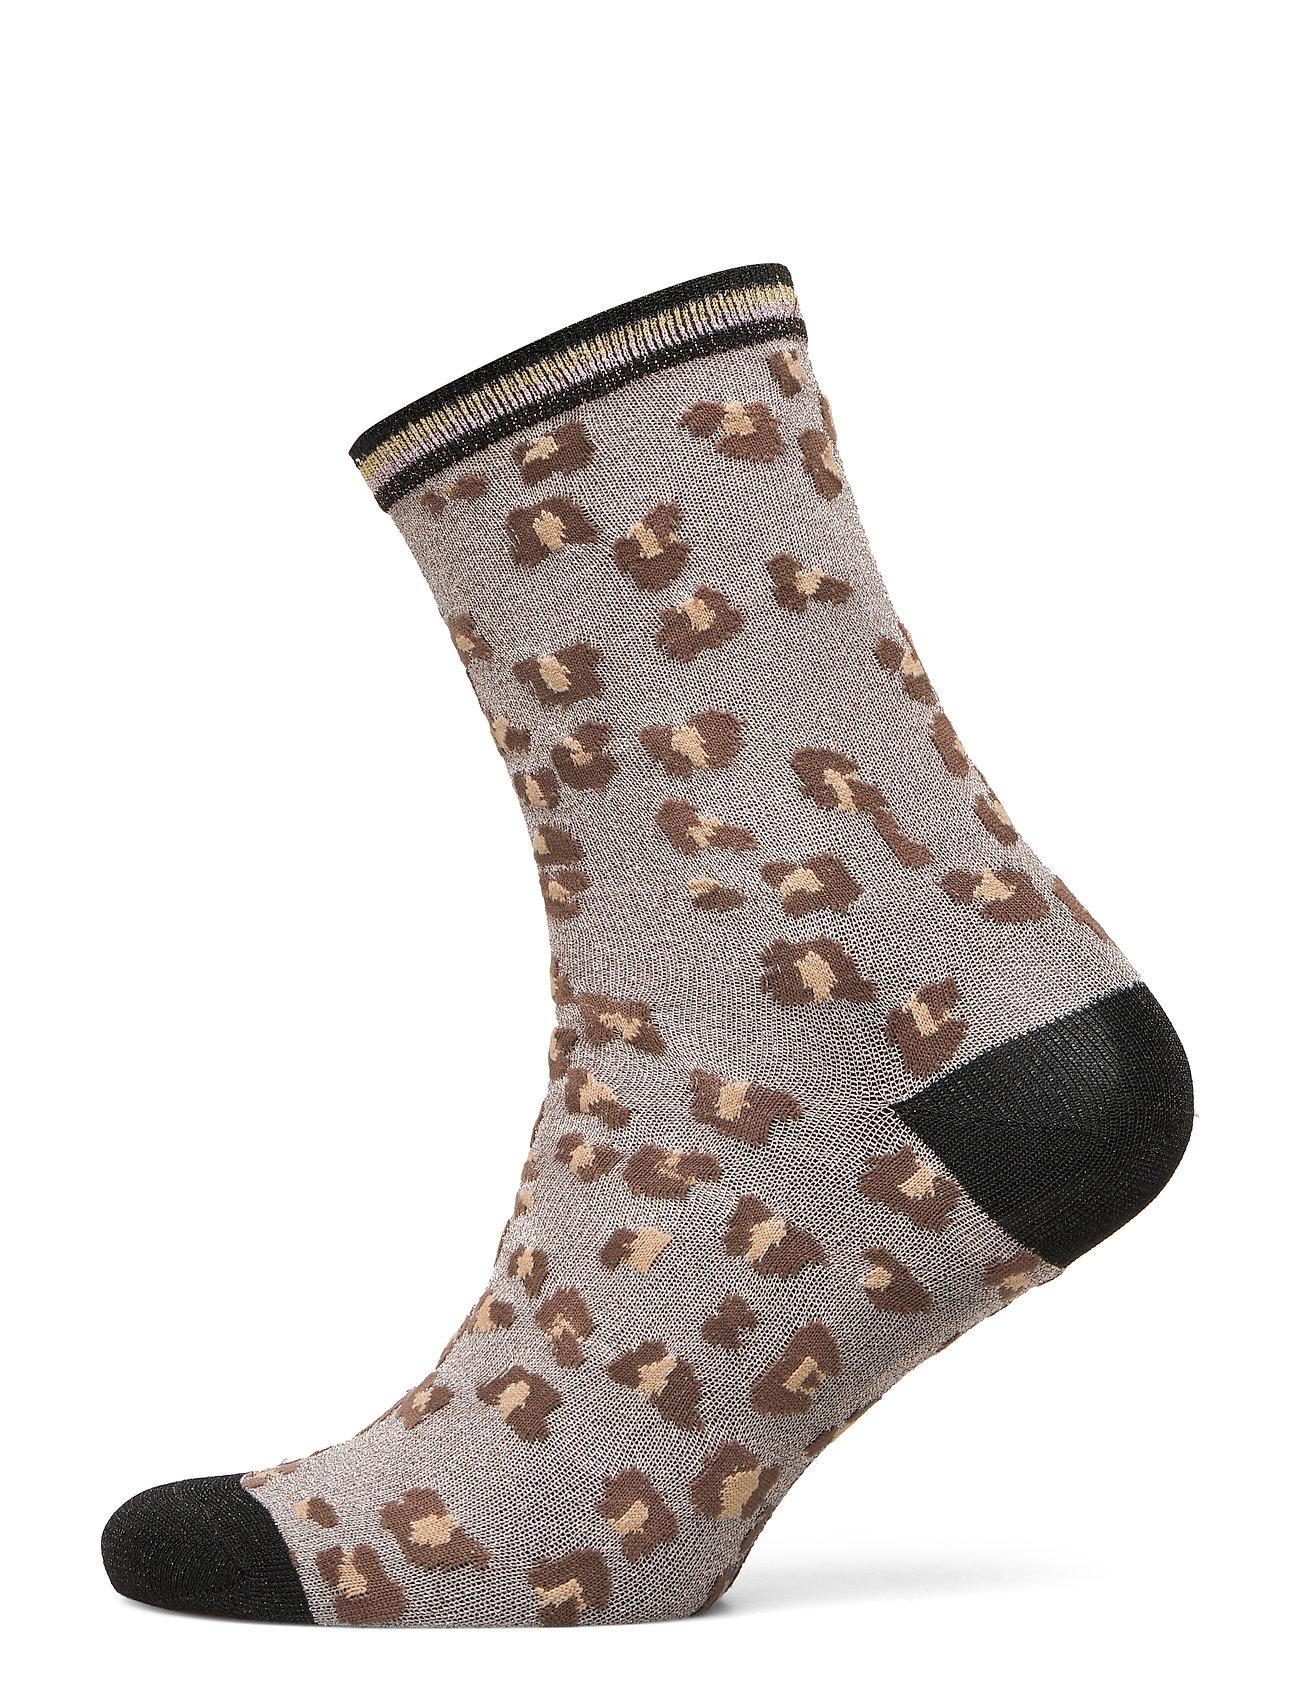 UNMADE Copenhagen Caree sock - CHOCOLATE